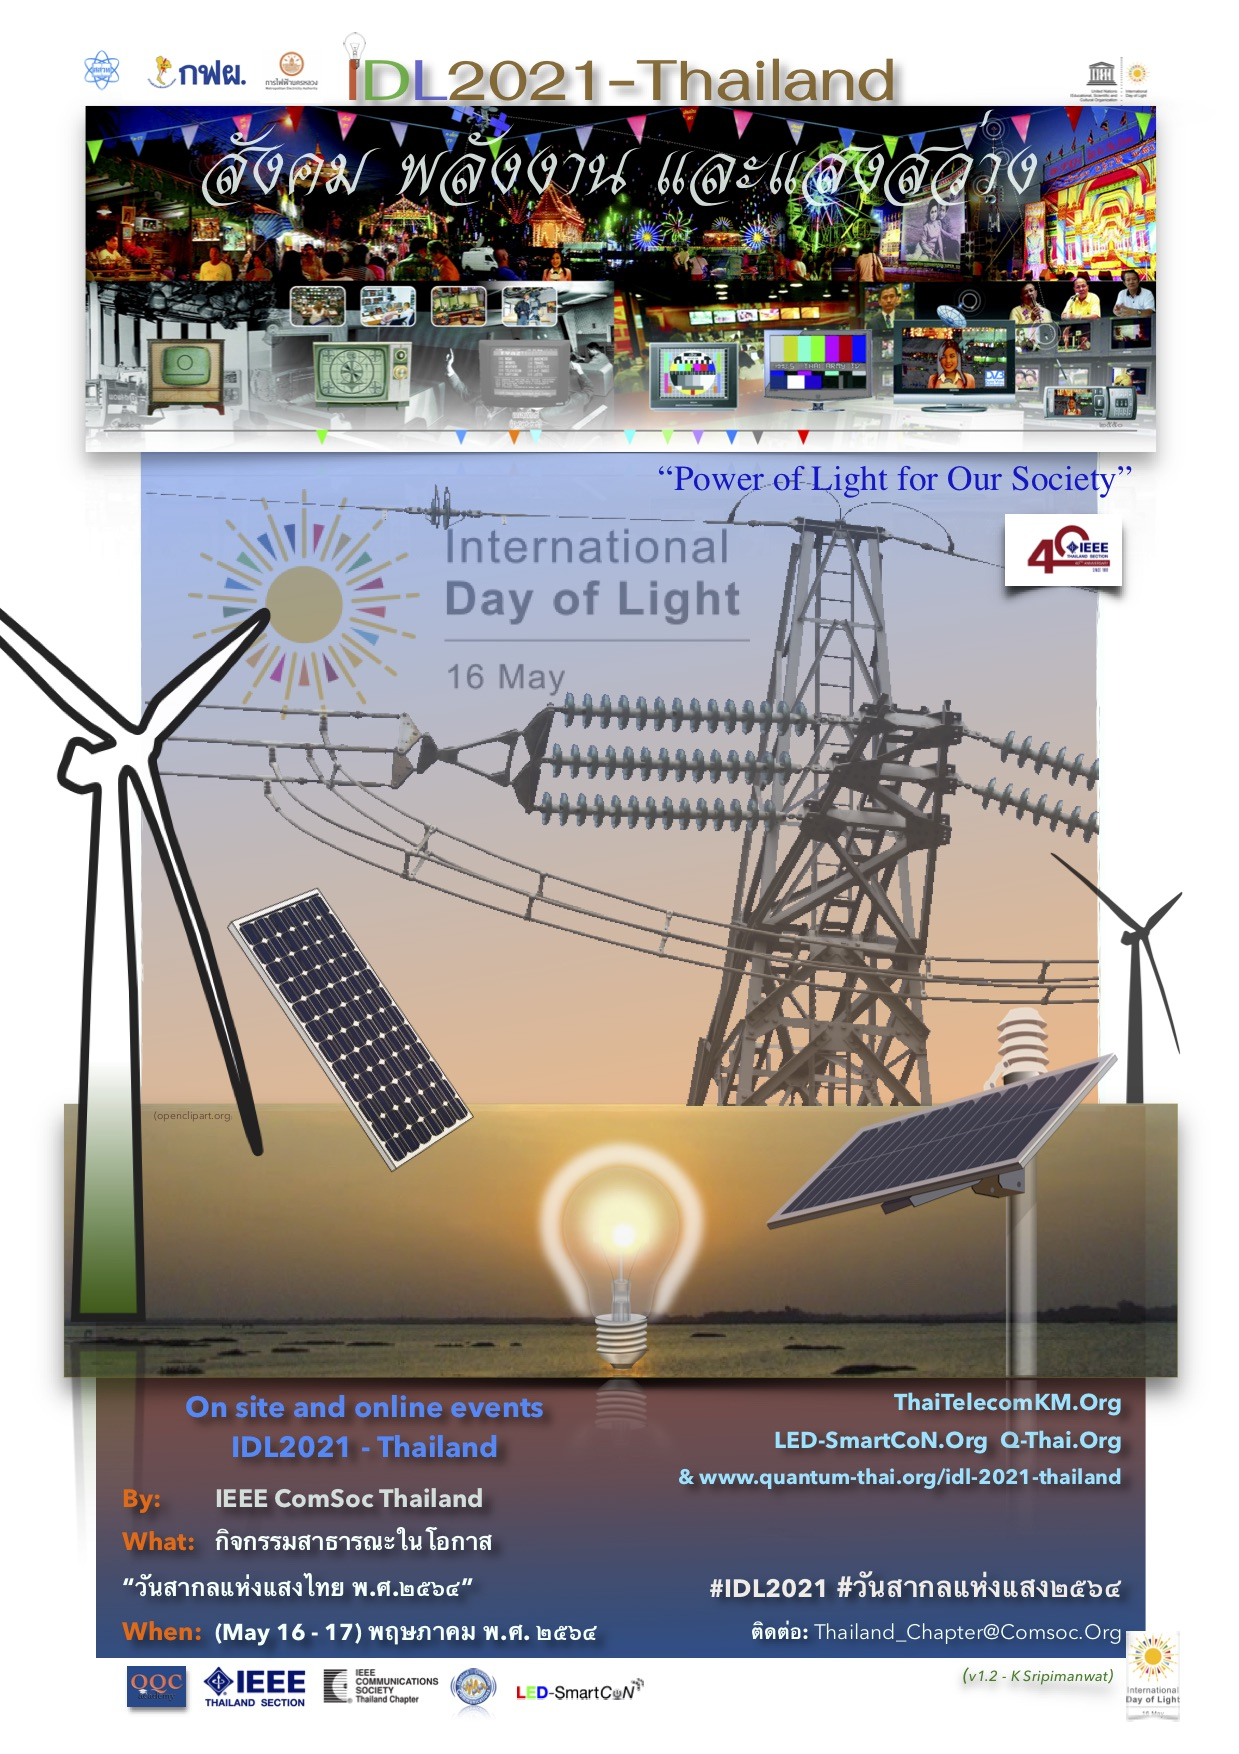 IDL2021 - Thailand Poster